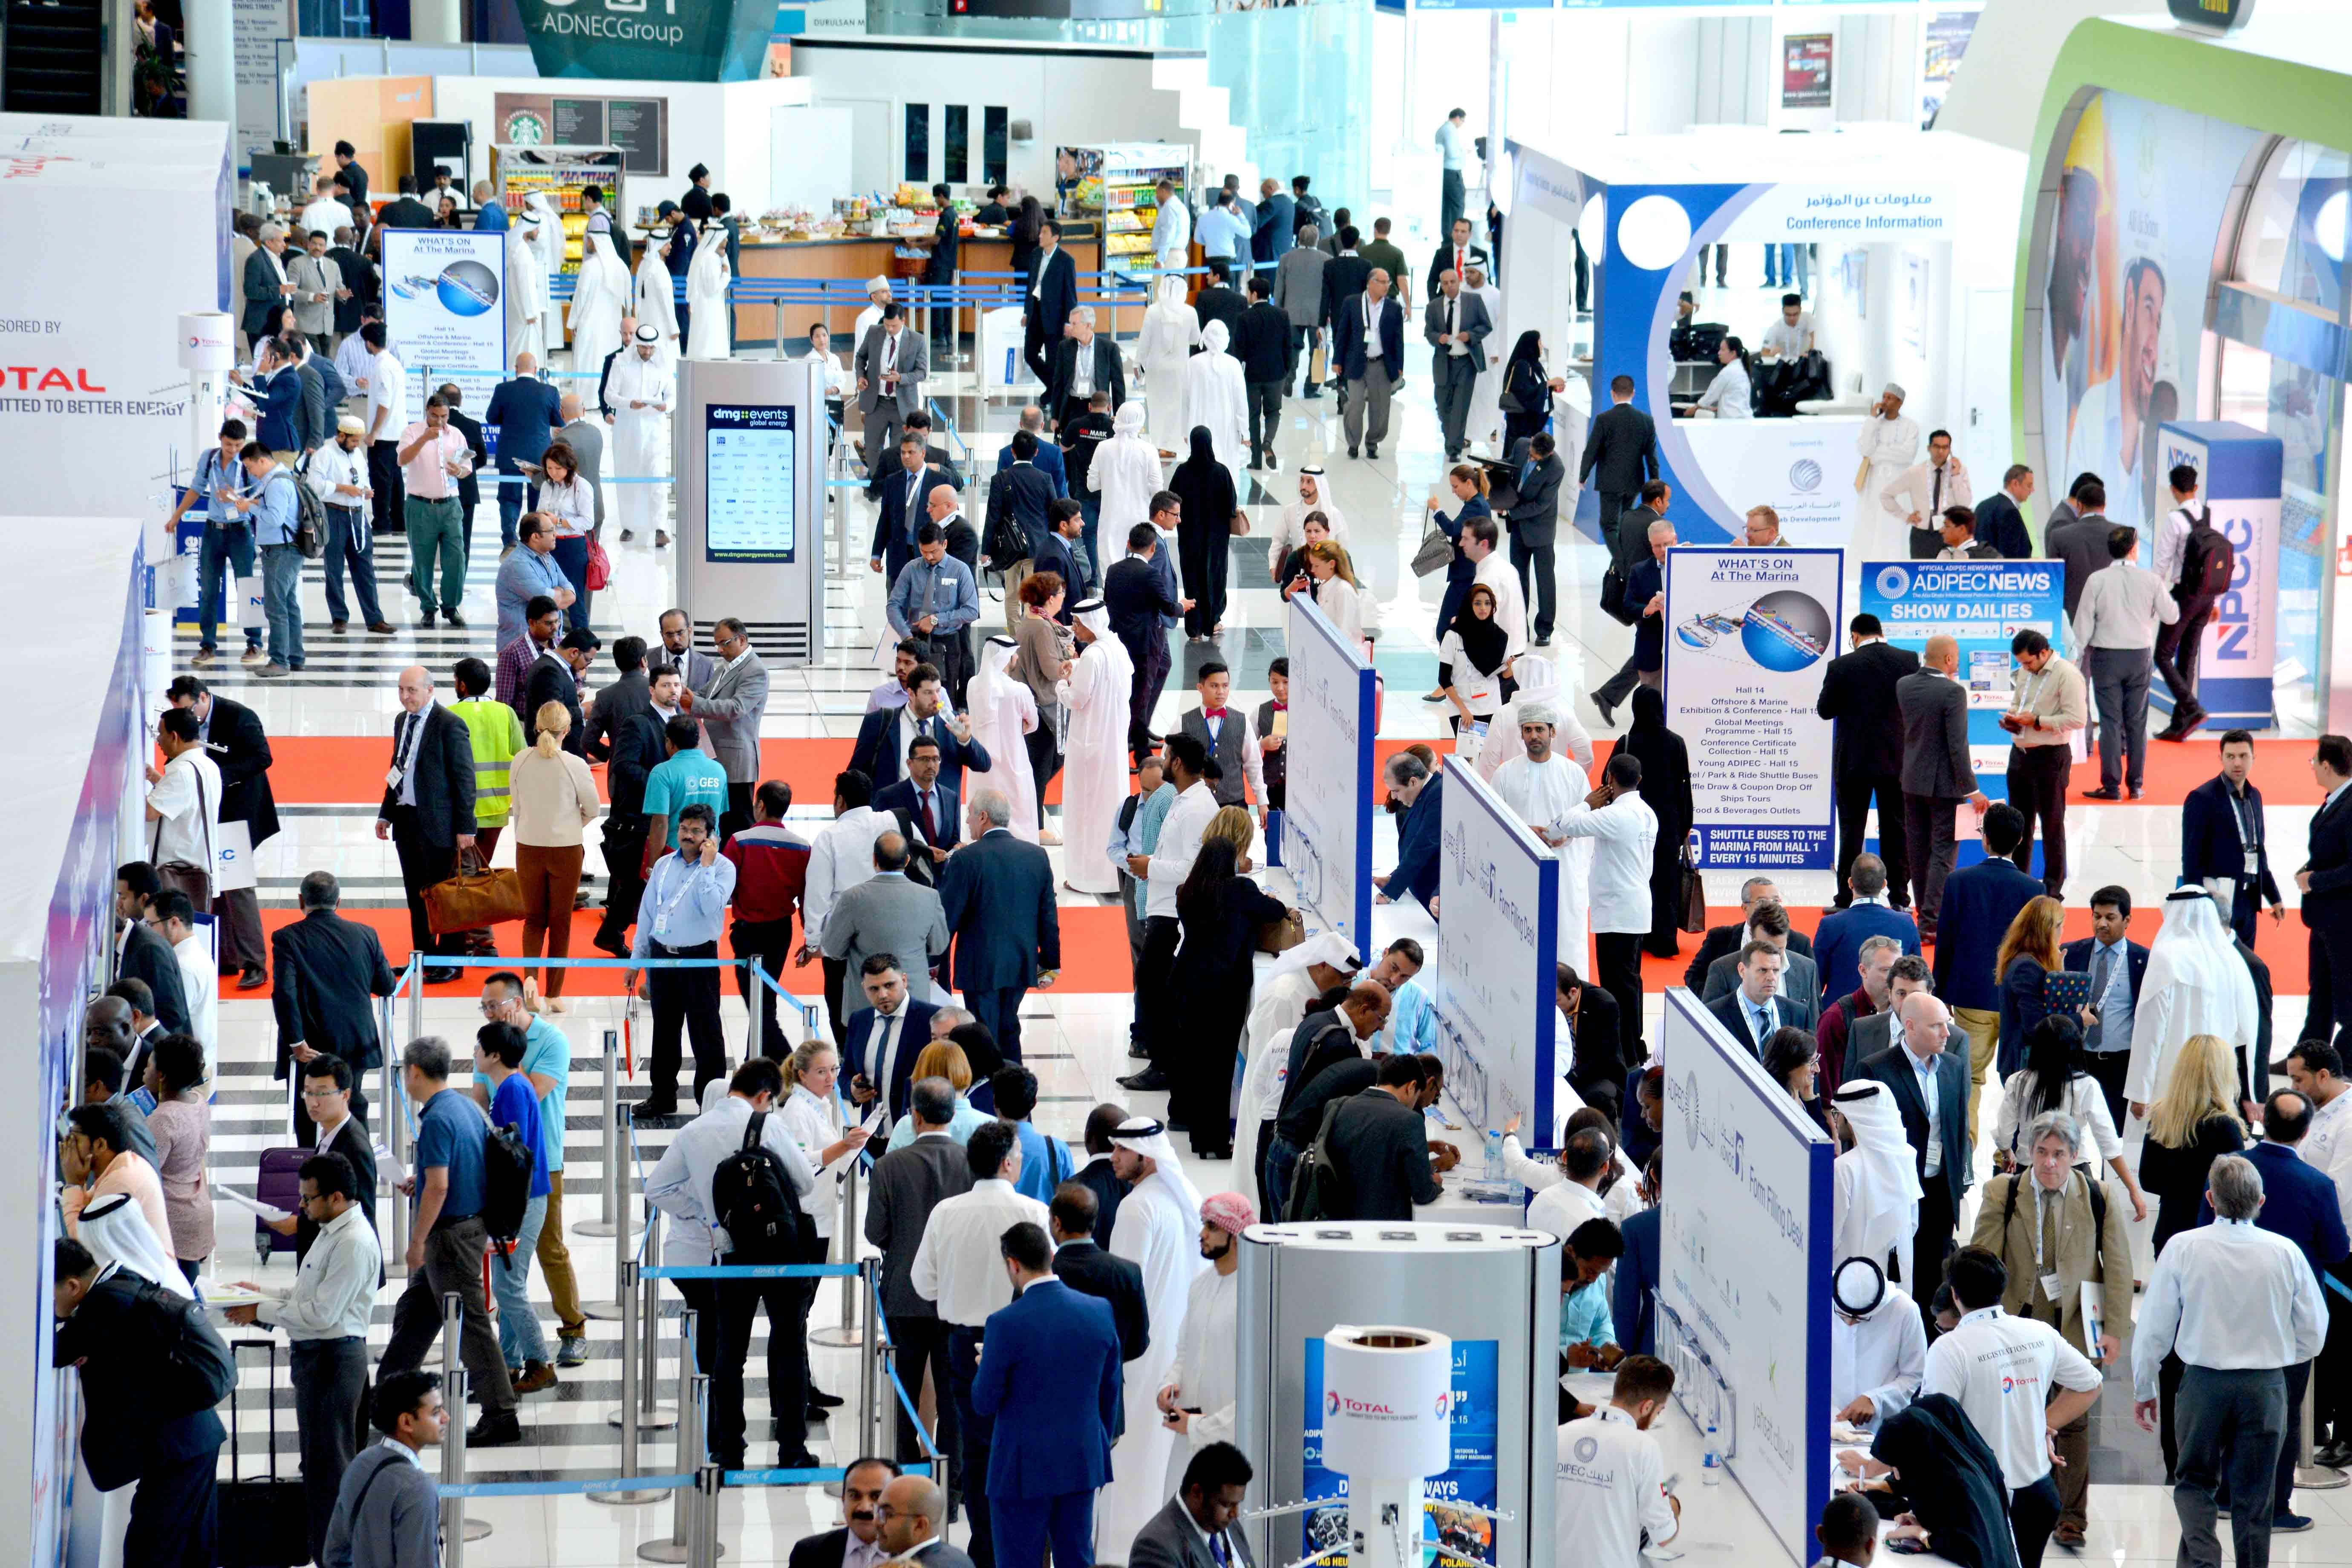 World's Energy Giants to Convene at ADIPEC 2017